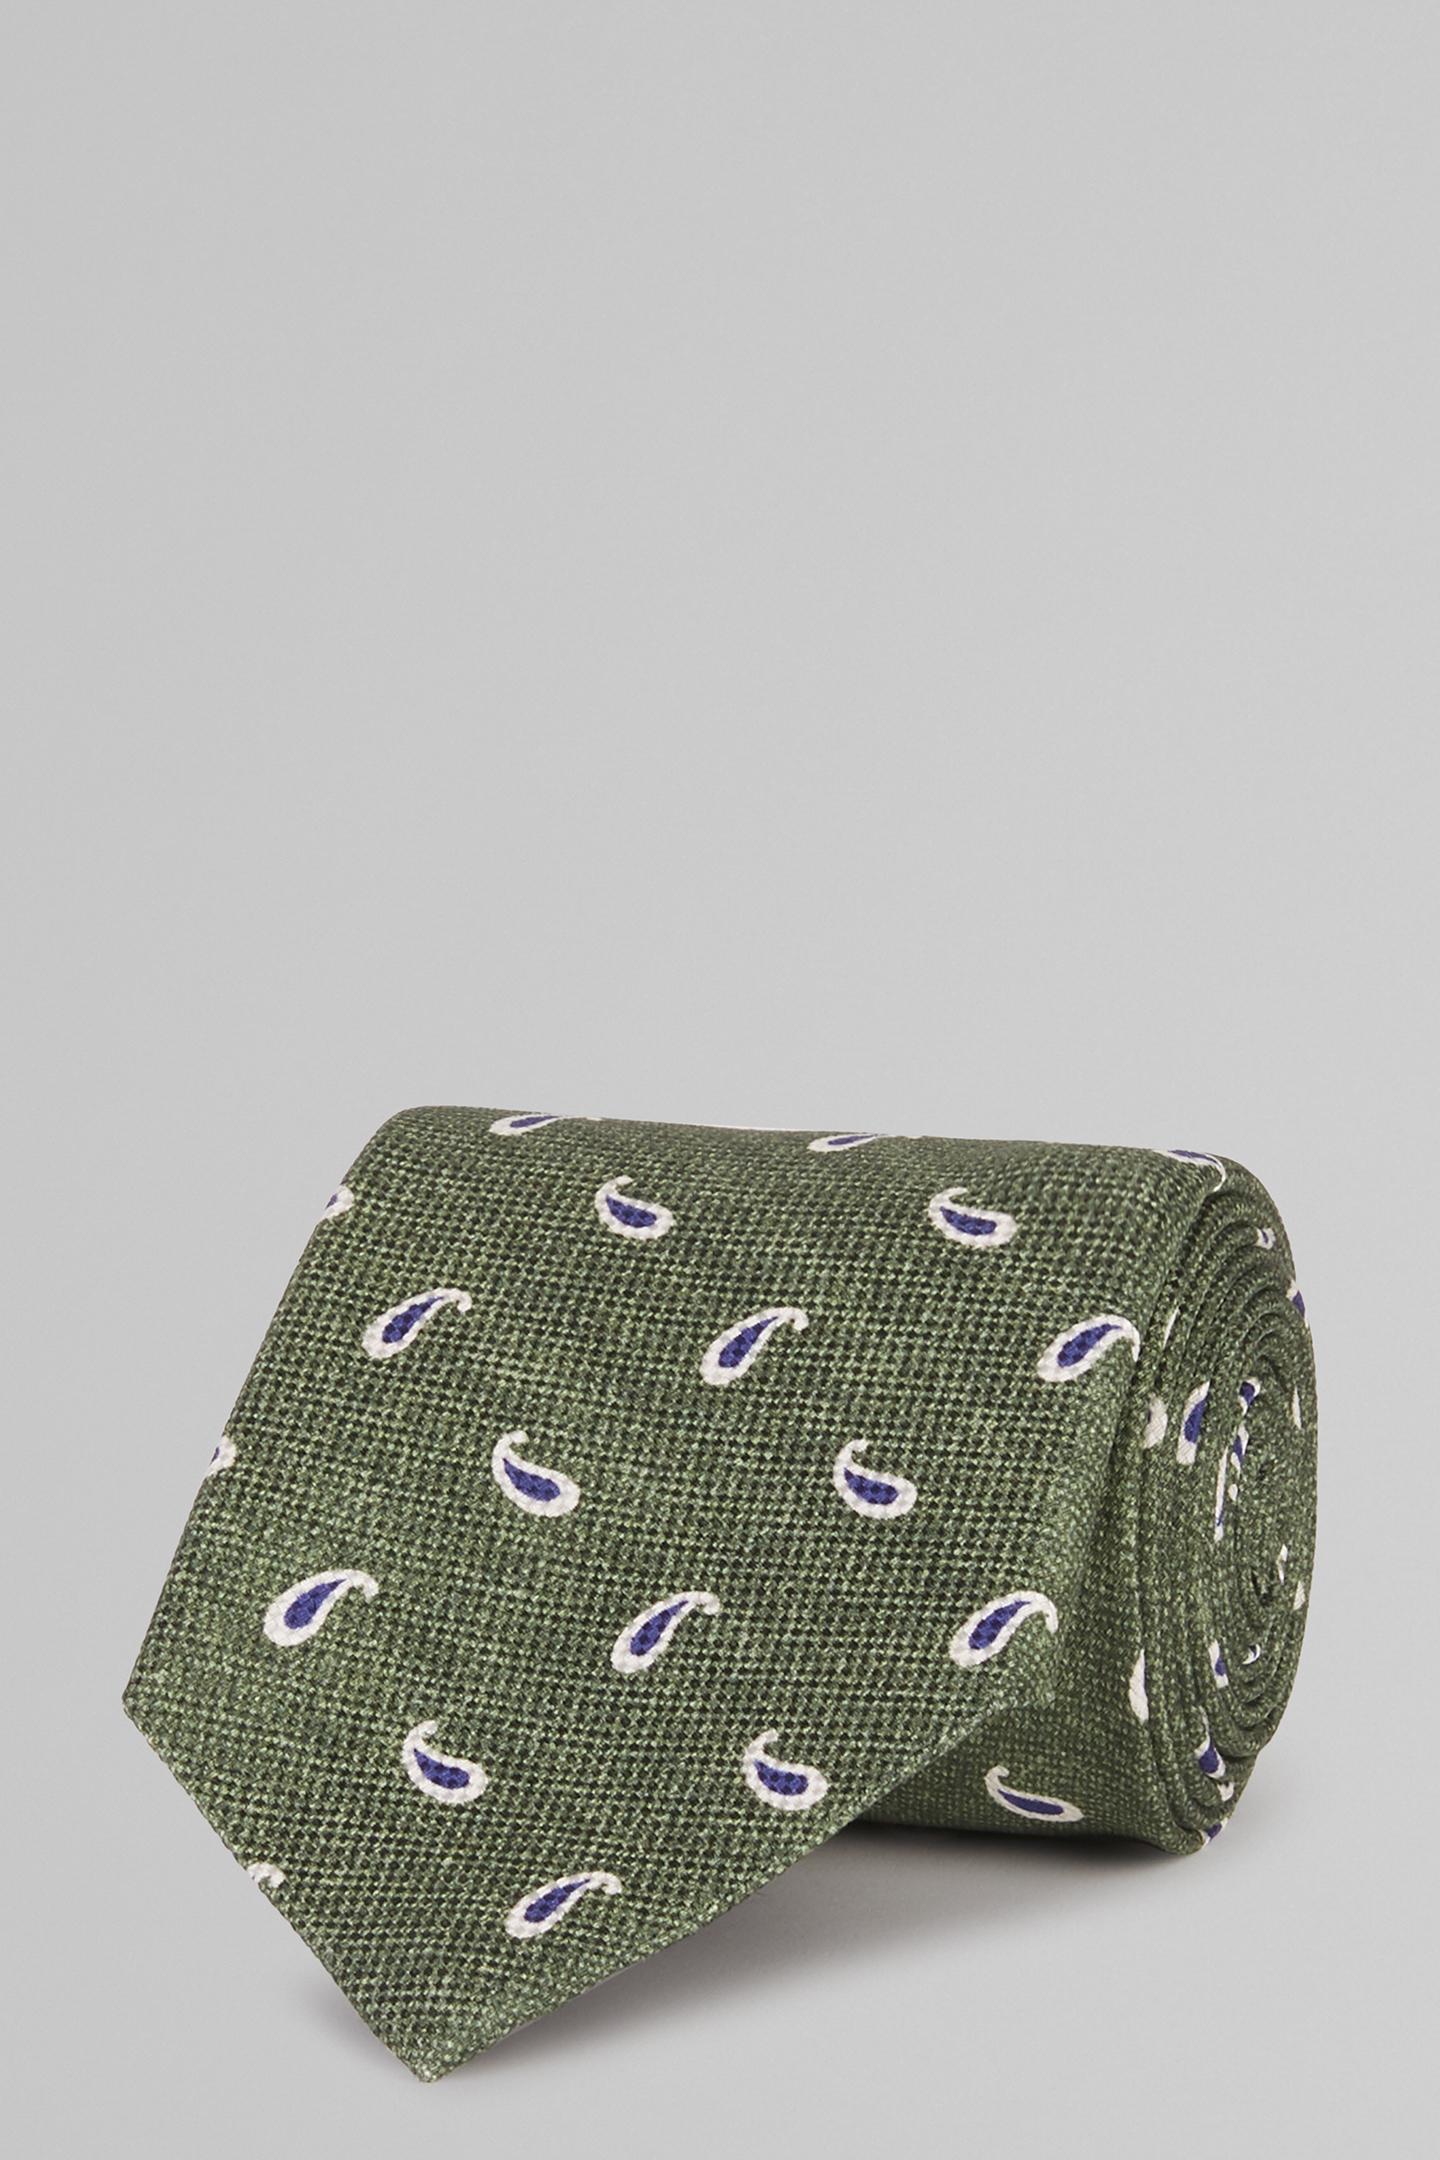 Corbata Boggi De Seda Con Estampado Paisley